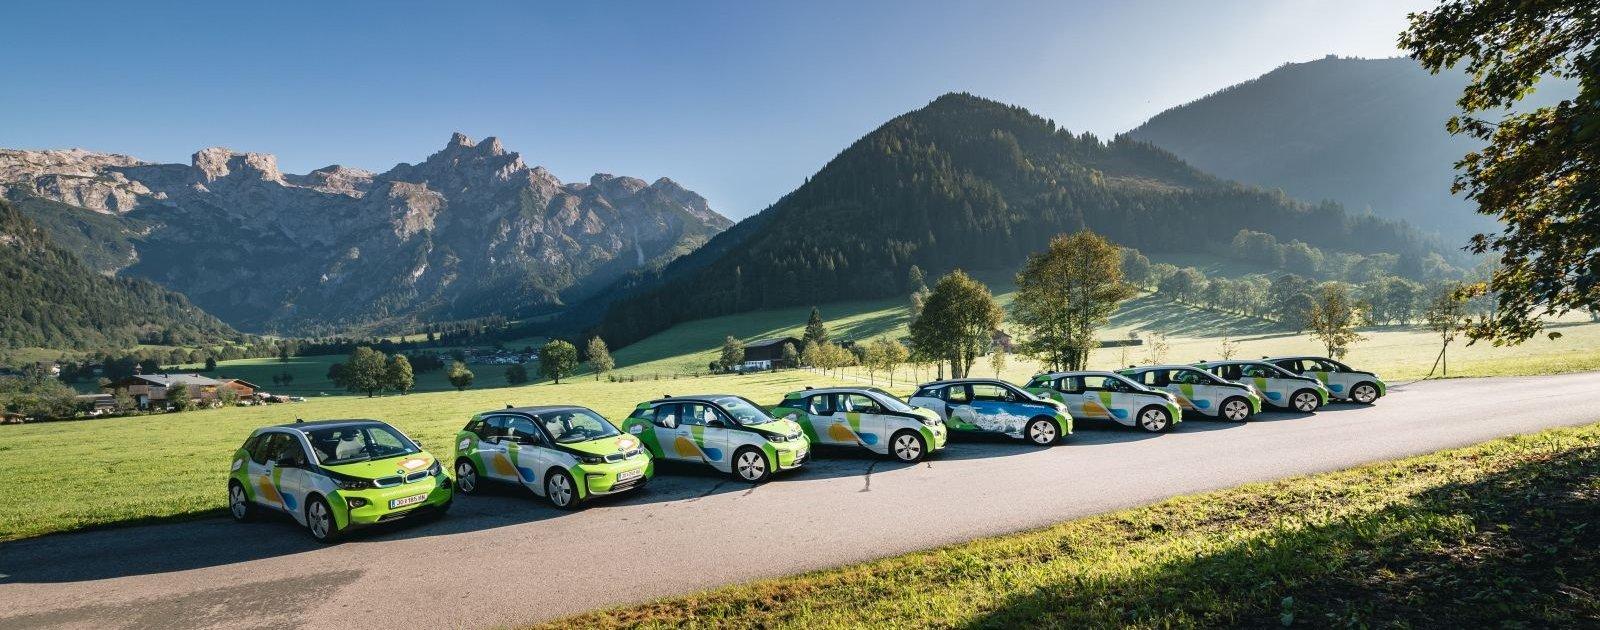 Elektroautos in Werfenweng (c) Christian Schartner